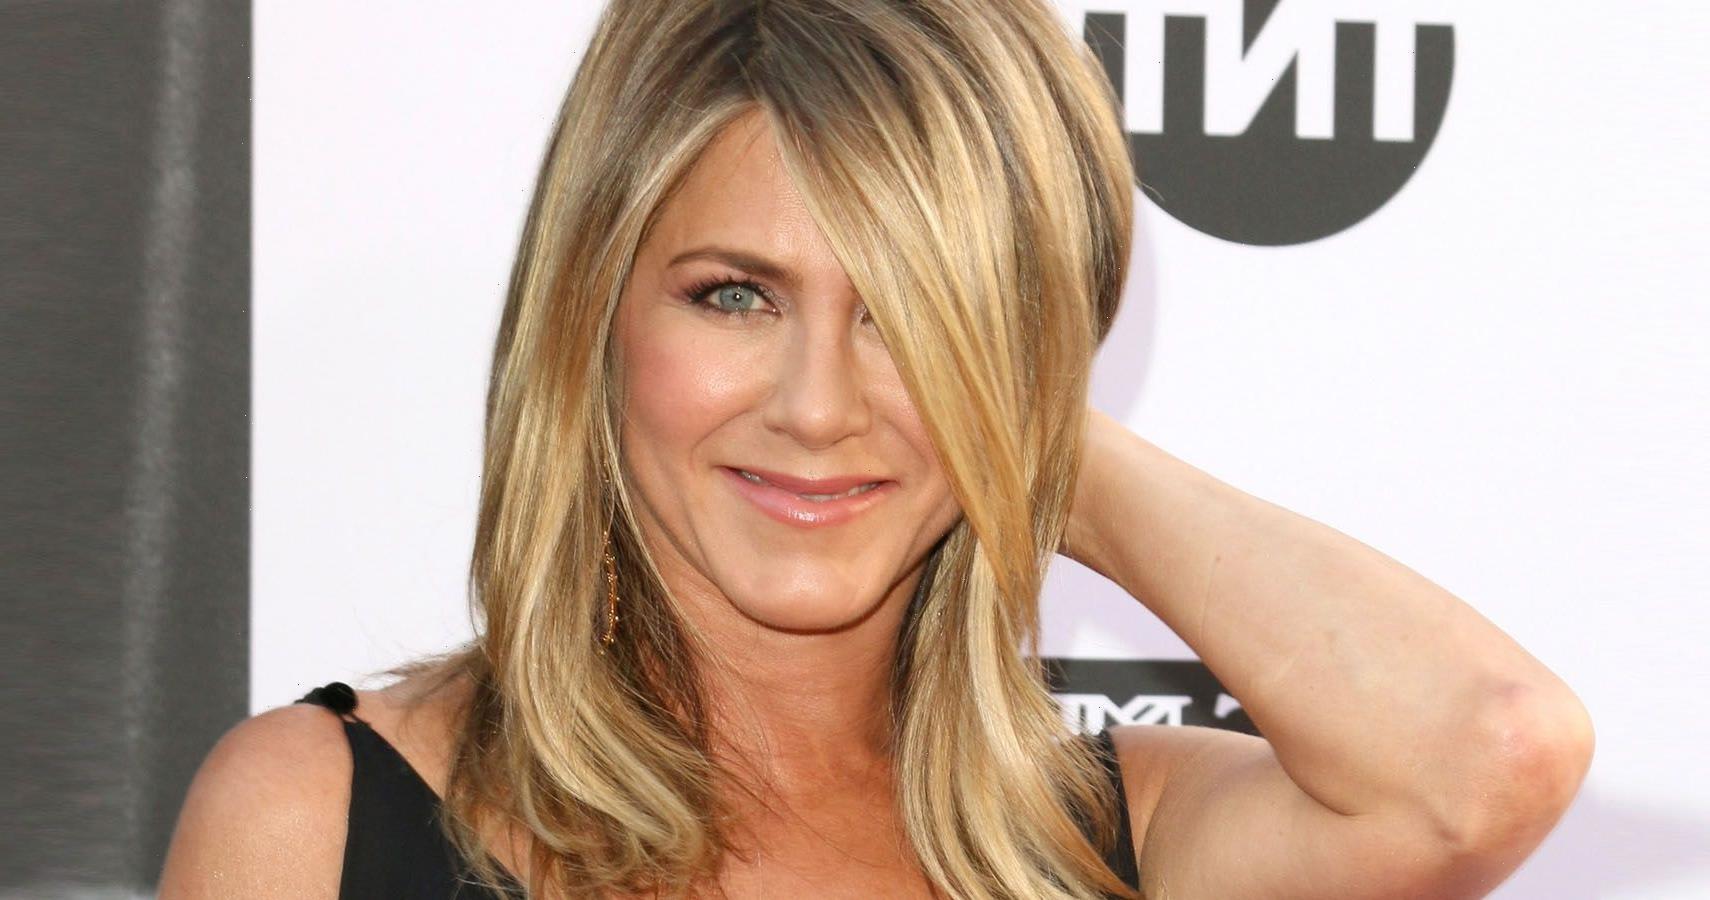 Jennifer Aniston's $300 Million Untouched Due To Adoption Decision